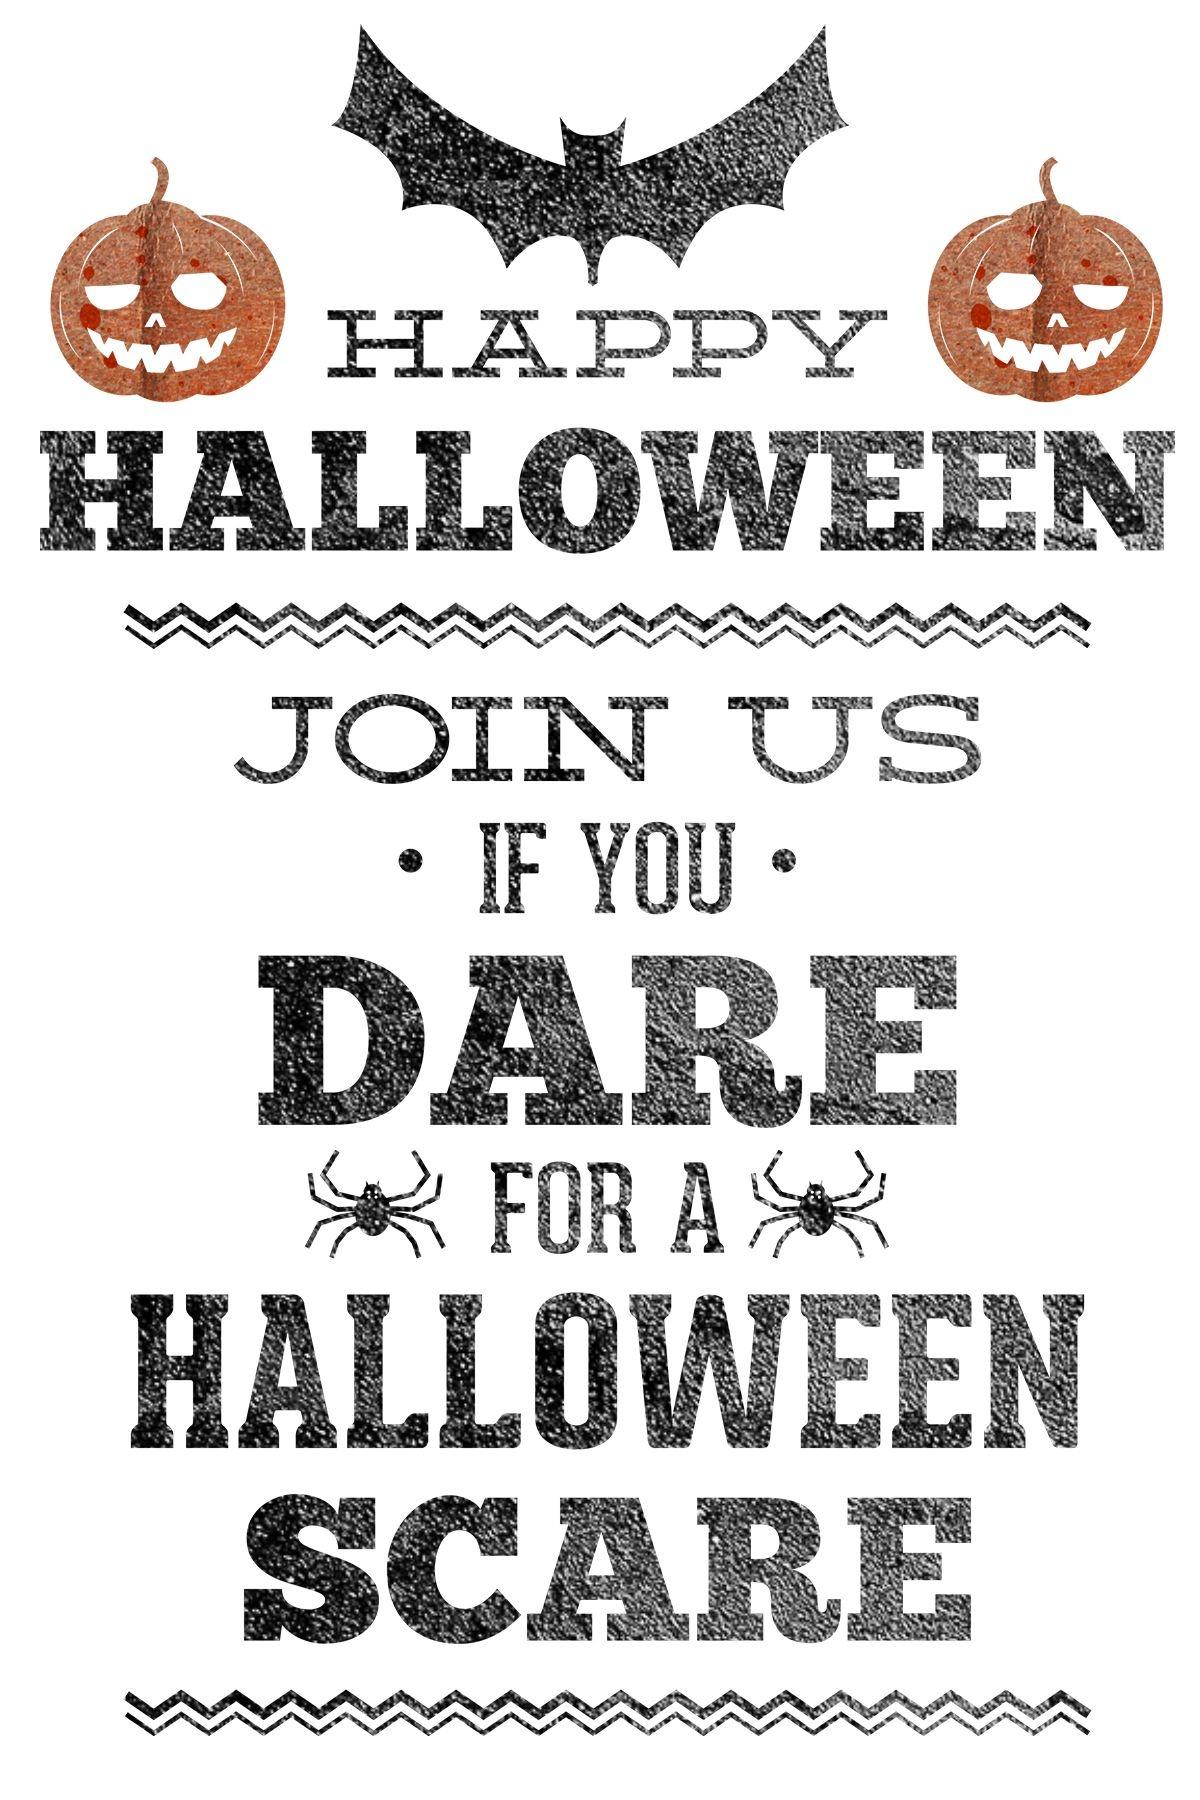 Free Printable Halloween Party Invitation   Halloween Printables 2 - Free Printable Halloween Party Invitations